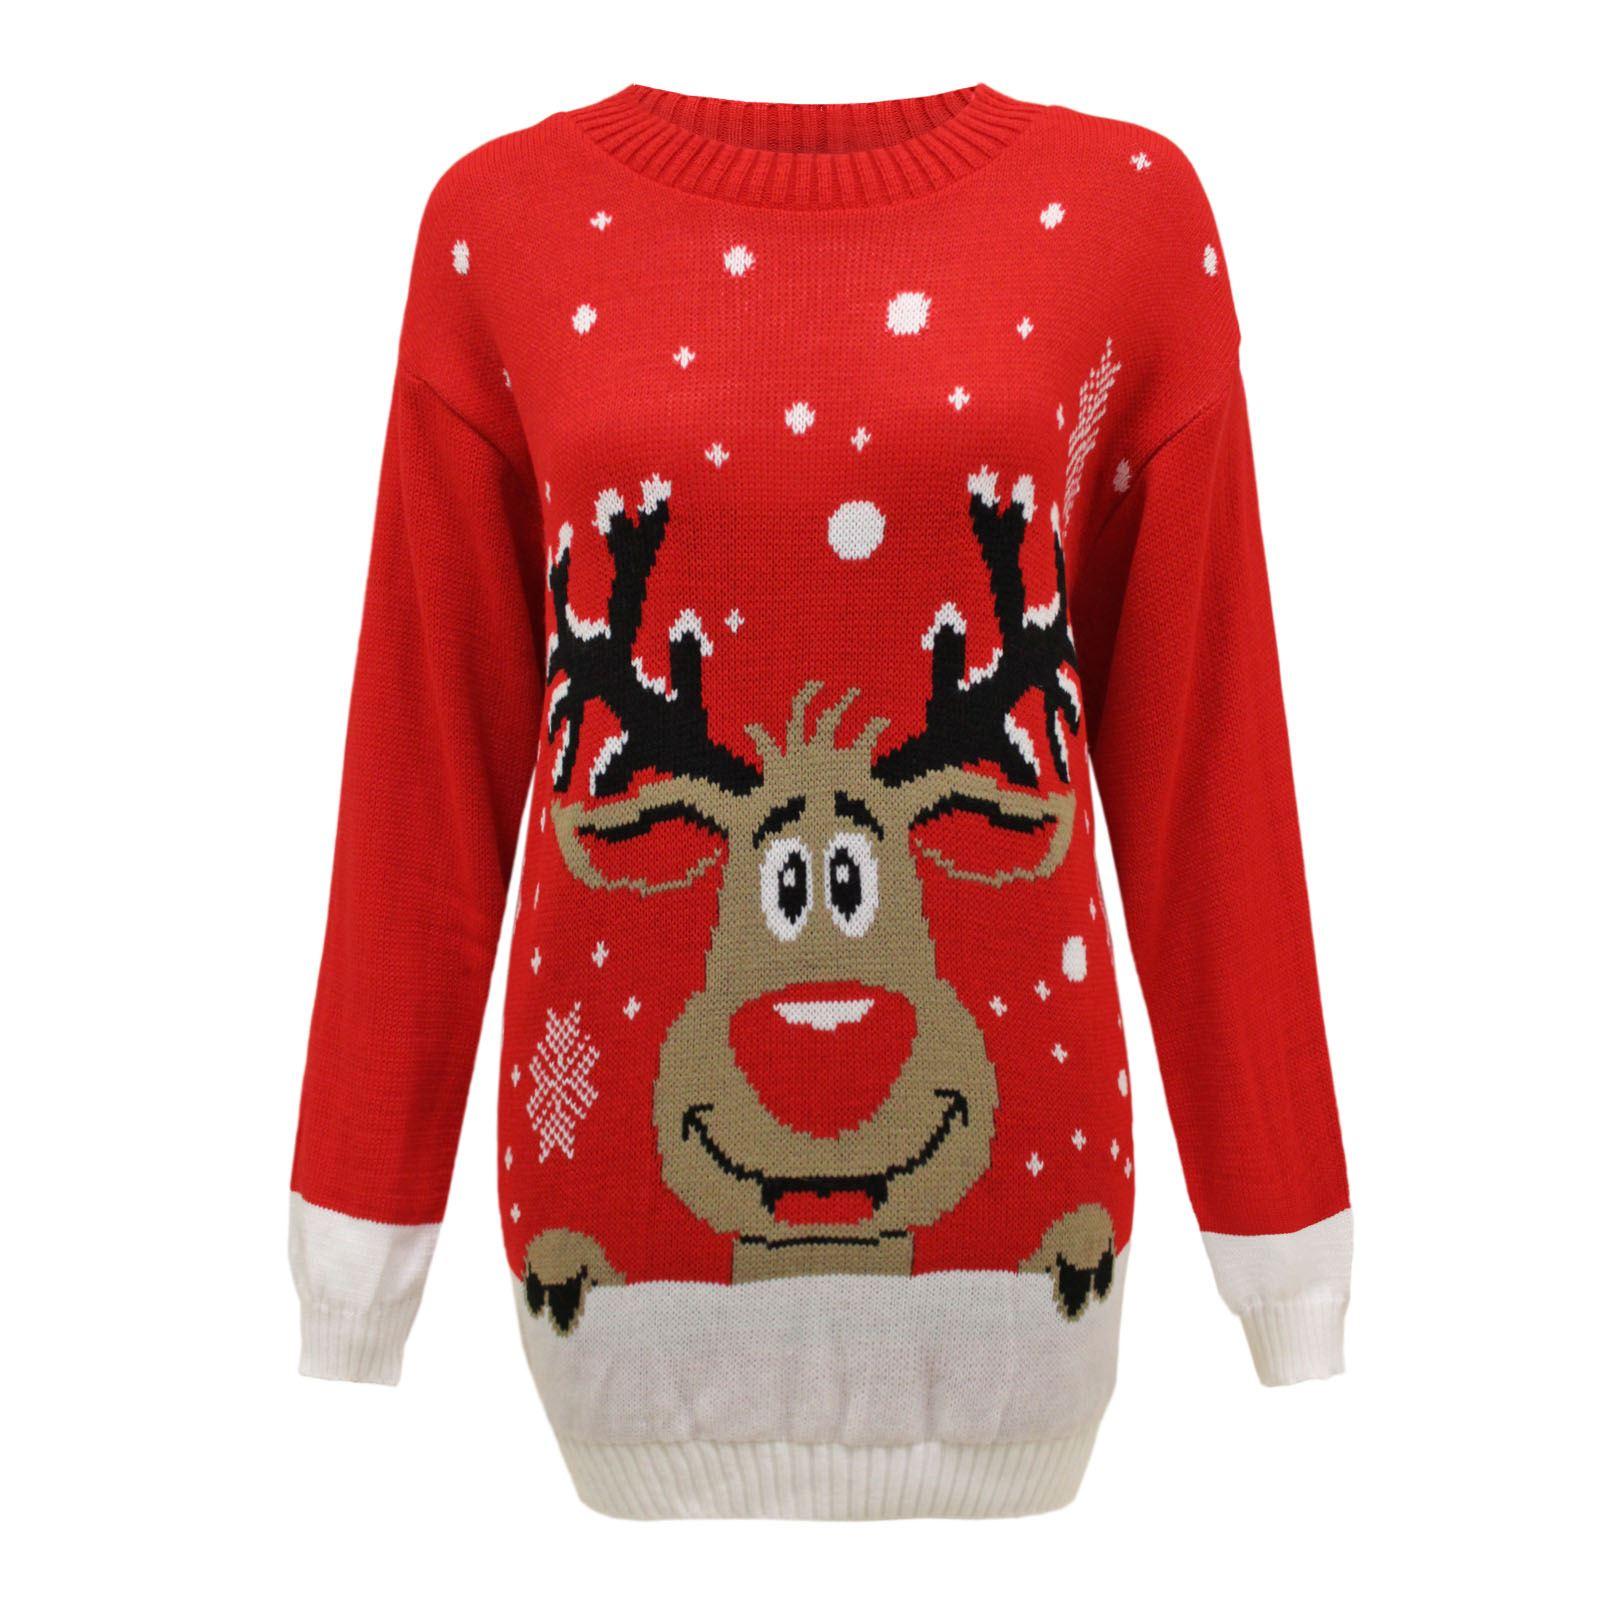 Spreadshirt Geek Binary Ugly Christmas Sweater Women's Long Sleeve Jersey T-Shirt. Sold by Spreadshirt Inc. $ $ Spreadshirt Ugly Christmas Sweater Snowman Carrot Thief Women's T-Shirt. Sold by Spreadshirt Inc. $ $ Spreadshirt Ugly Christmas Sweater Pattern Women.